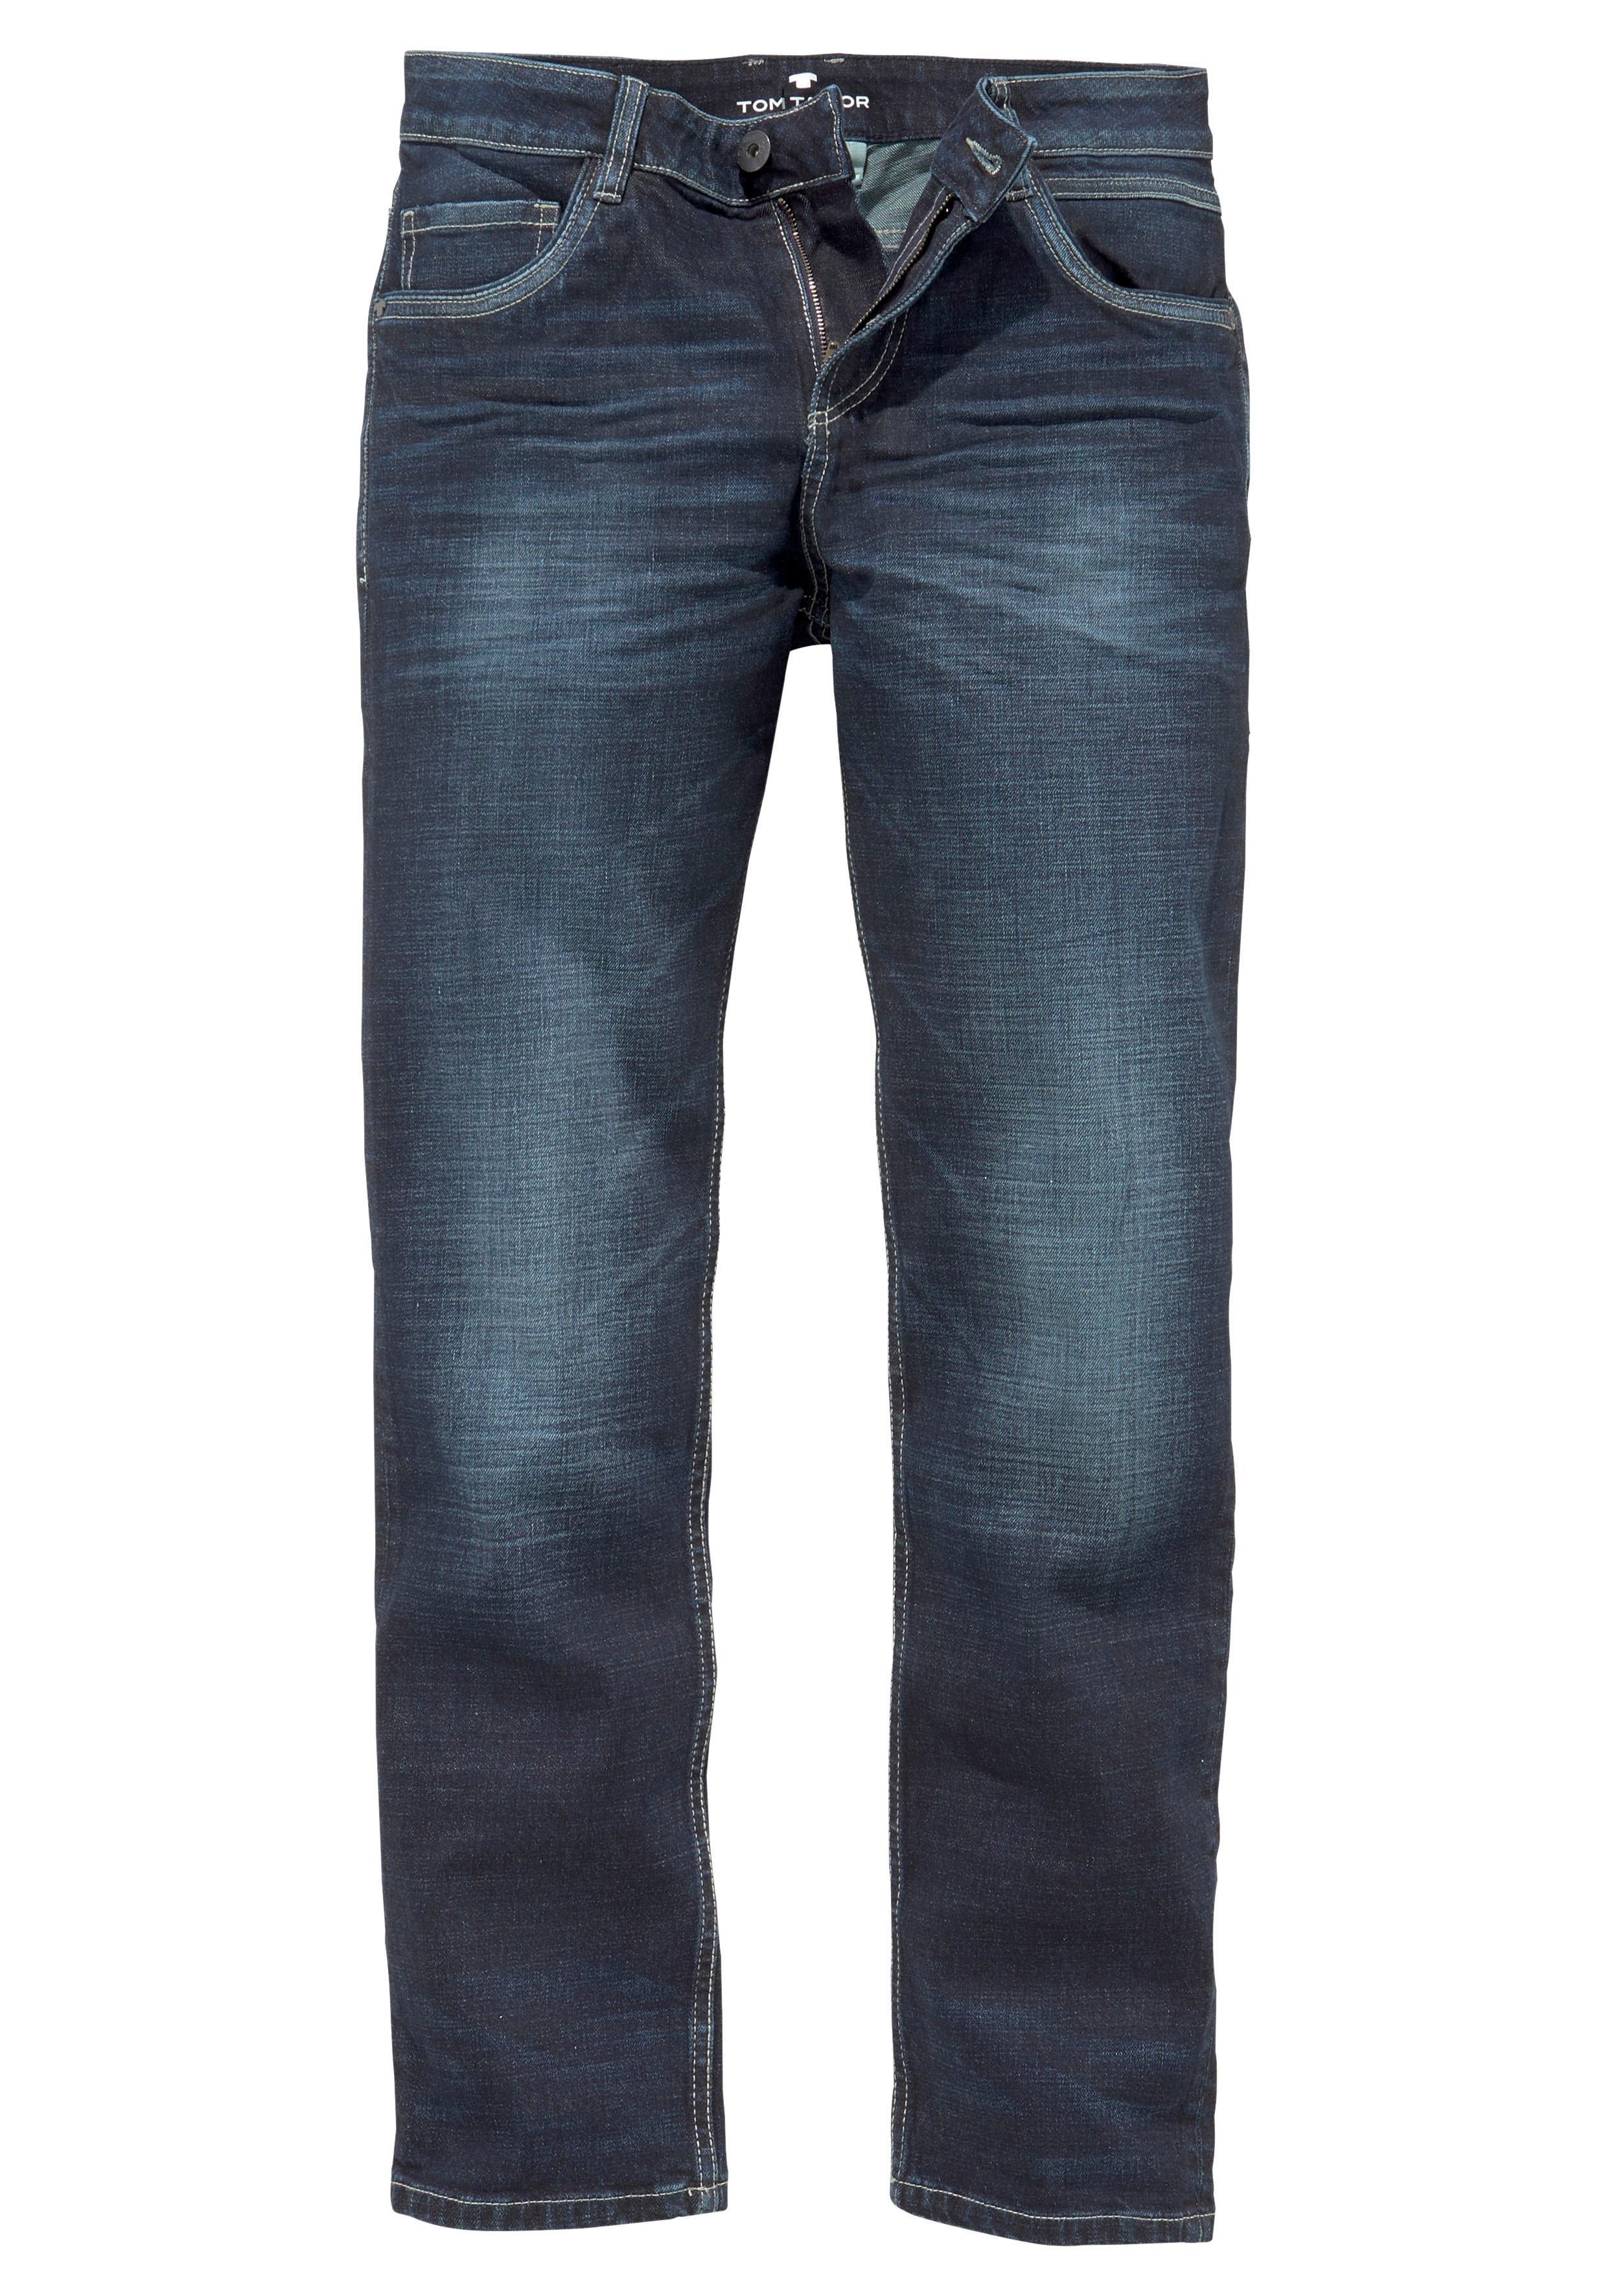 TOM TAILOR 5-pocket jeans voordelig en veilig online kopen